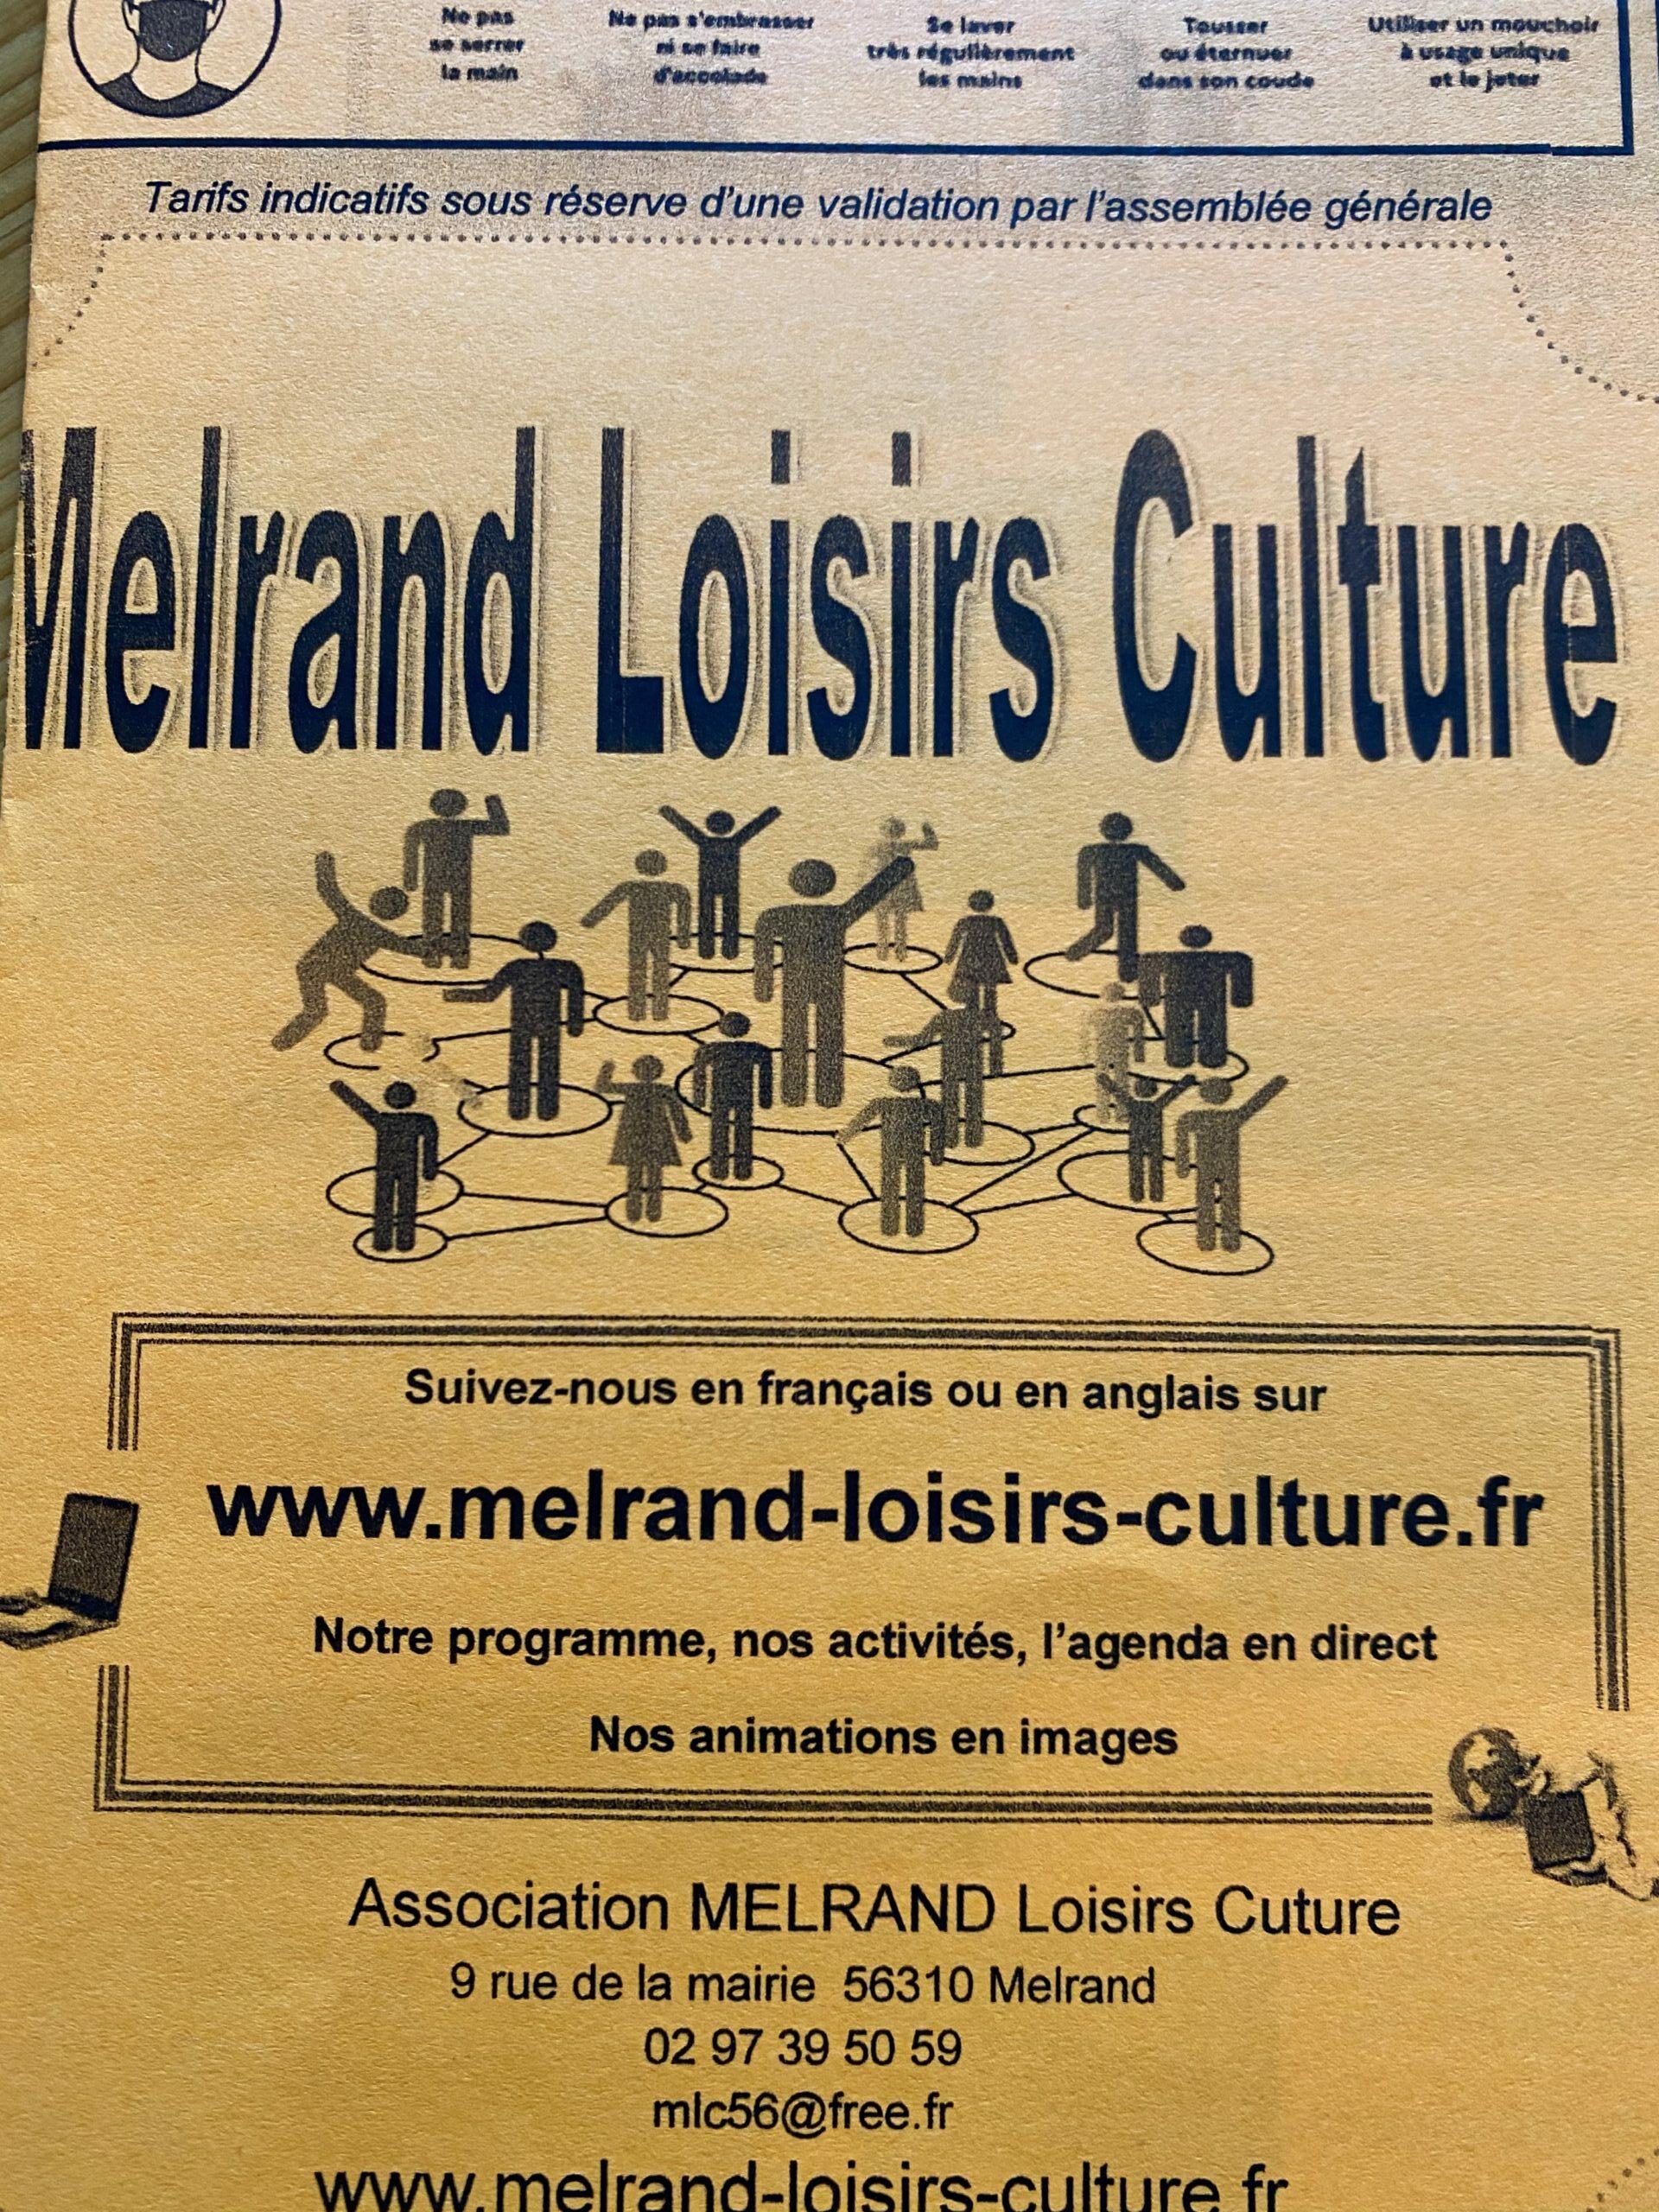 Melrand Loisirs Culture